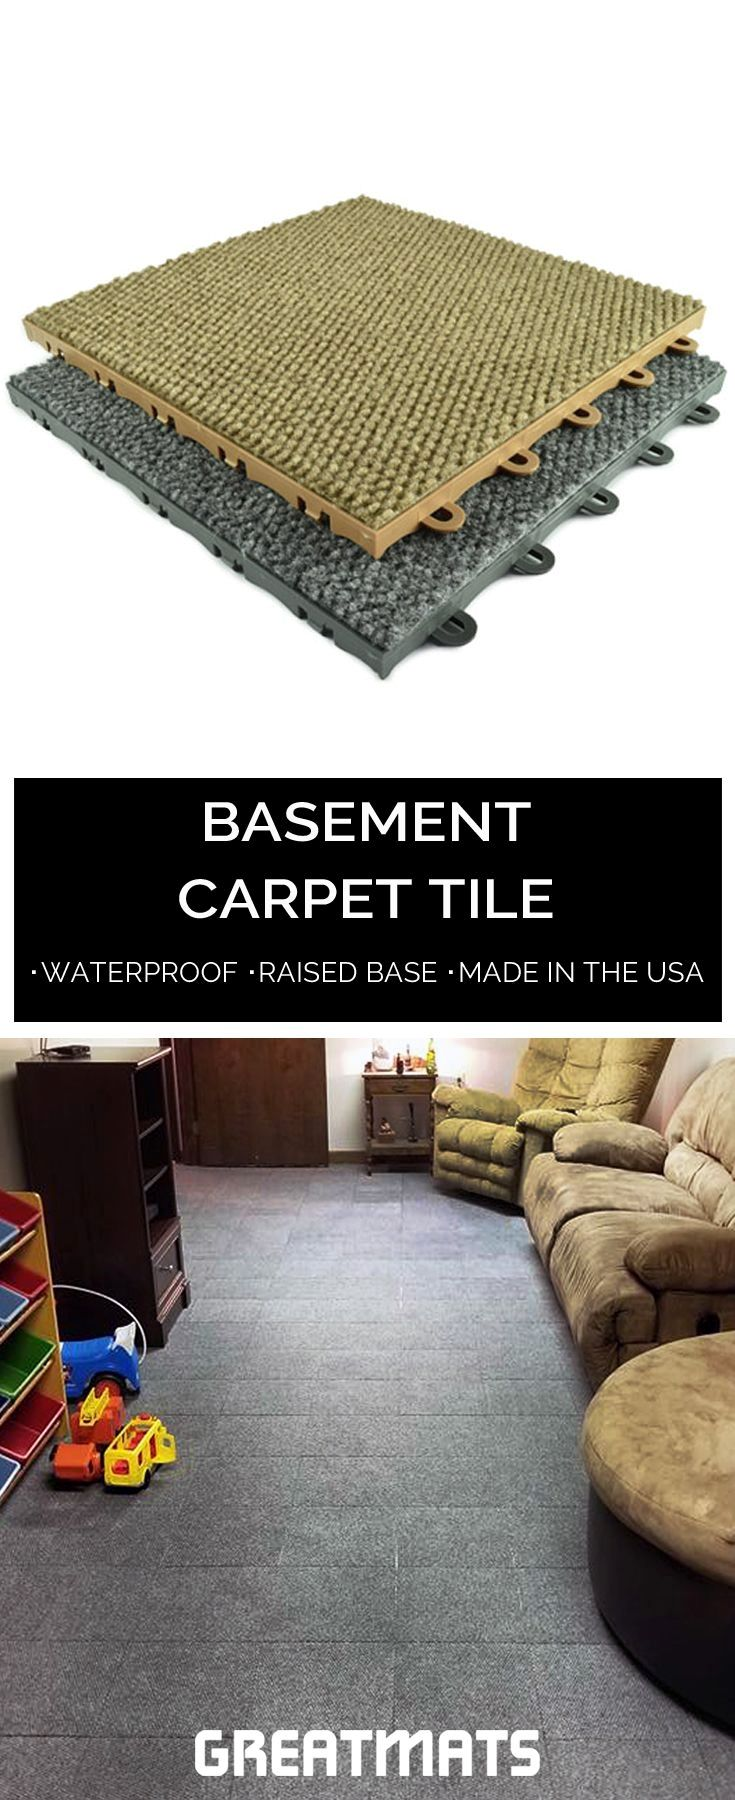 Carpet Tiles Modular Squares in 2019 Carpet tiles for